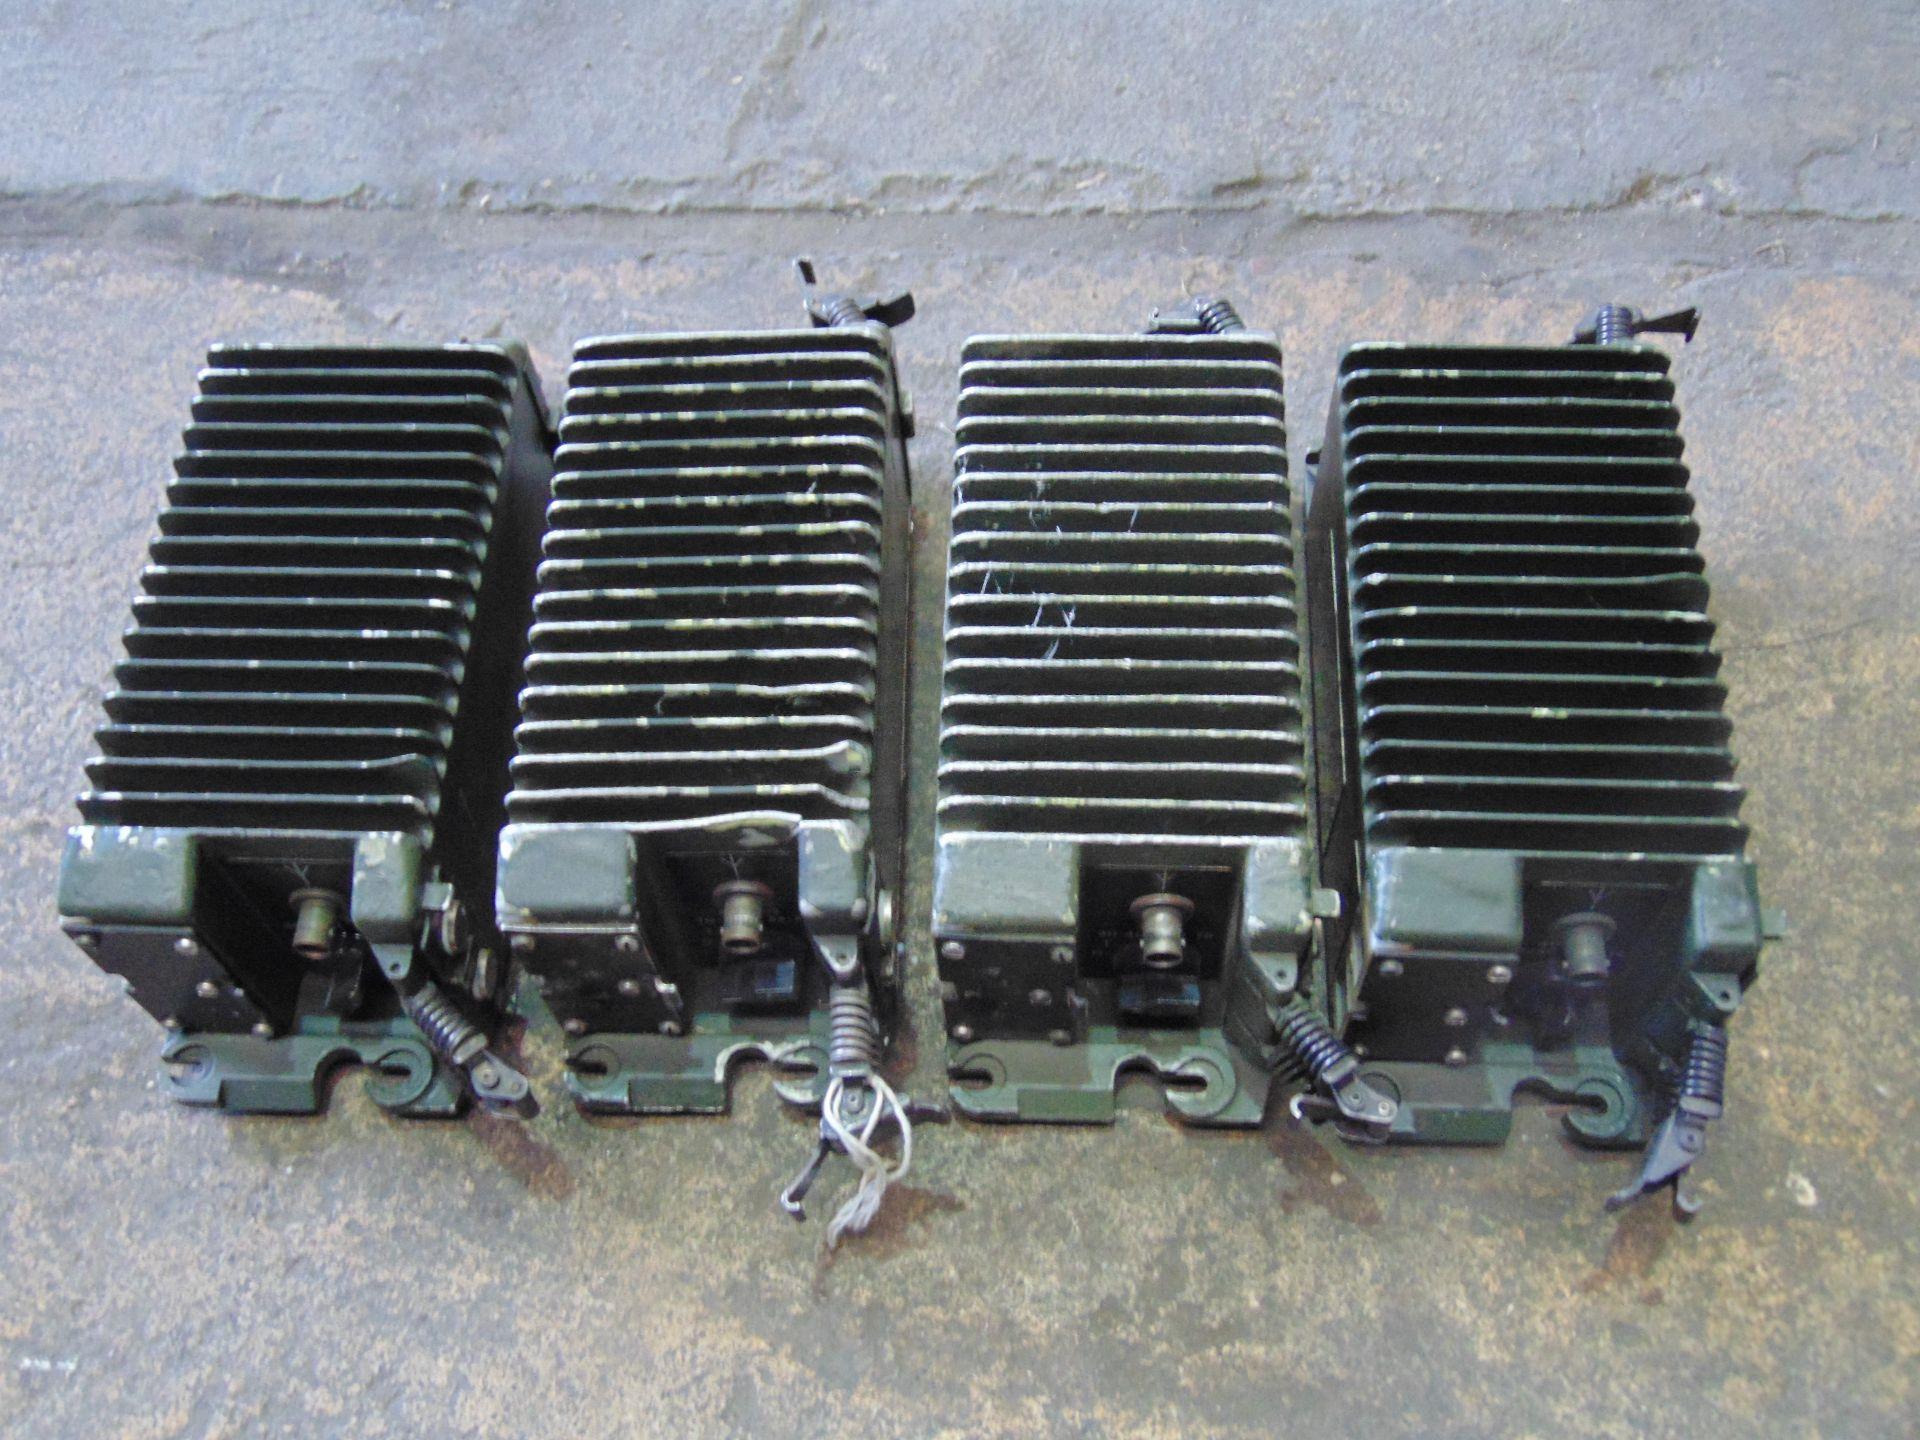 You are bidding on one lot of 4 x Clansman R F 20 Watt